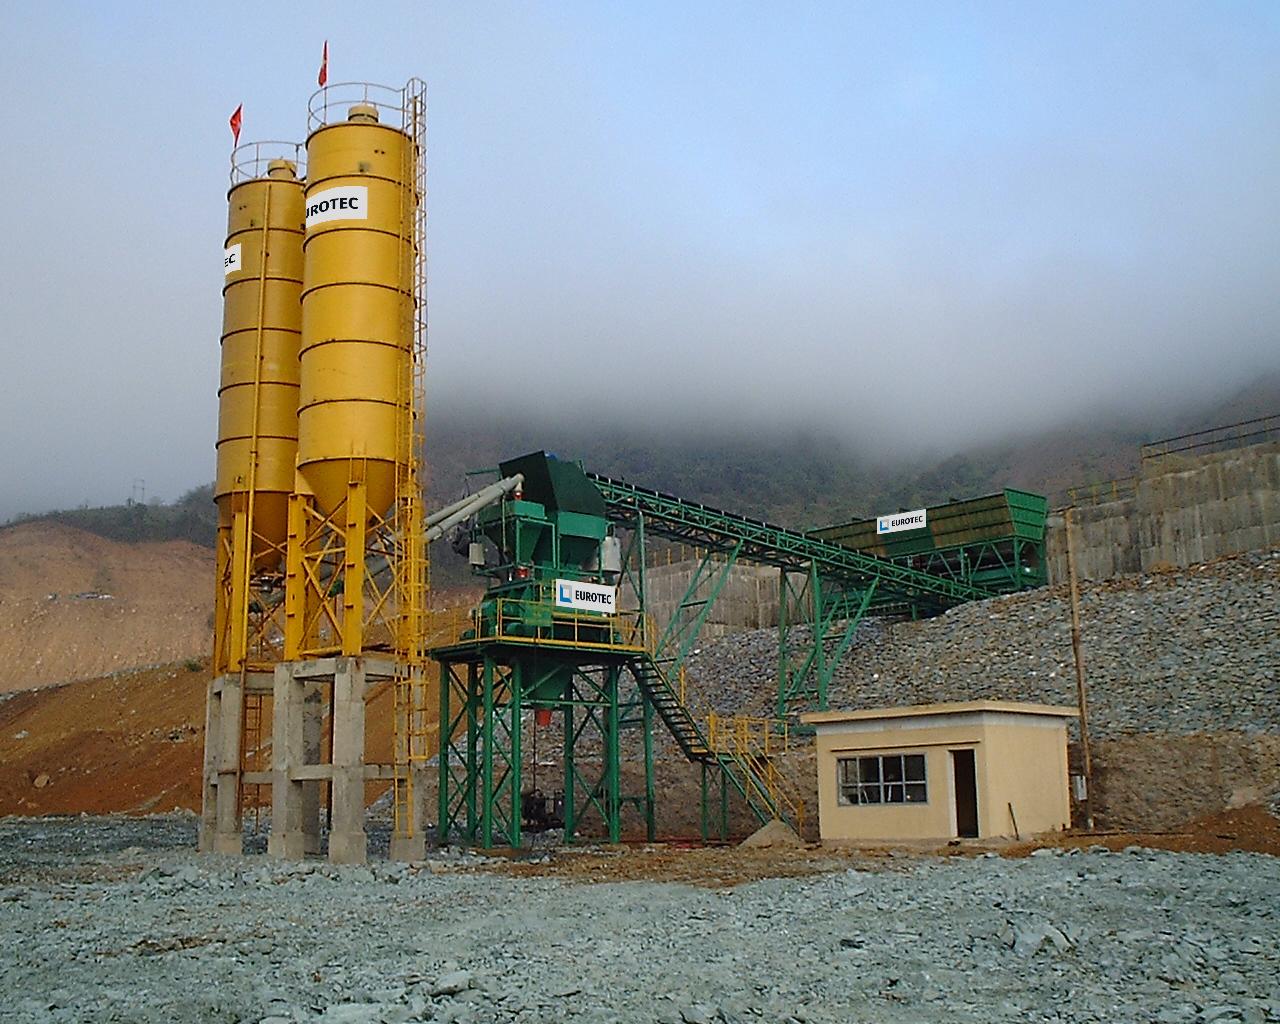 Construction of Sơn La hydropower dam in Vietnam